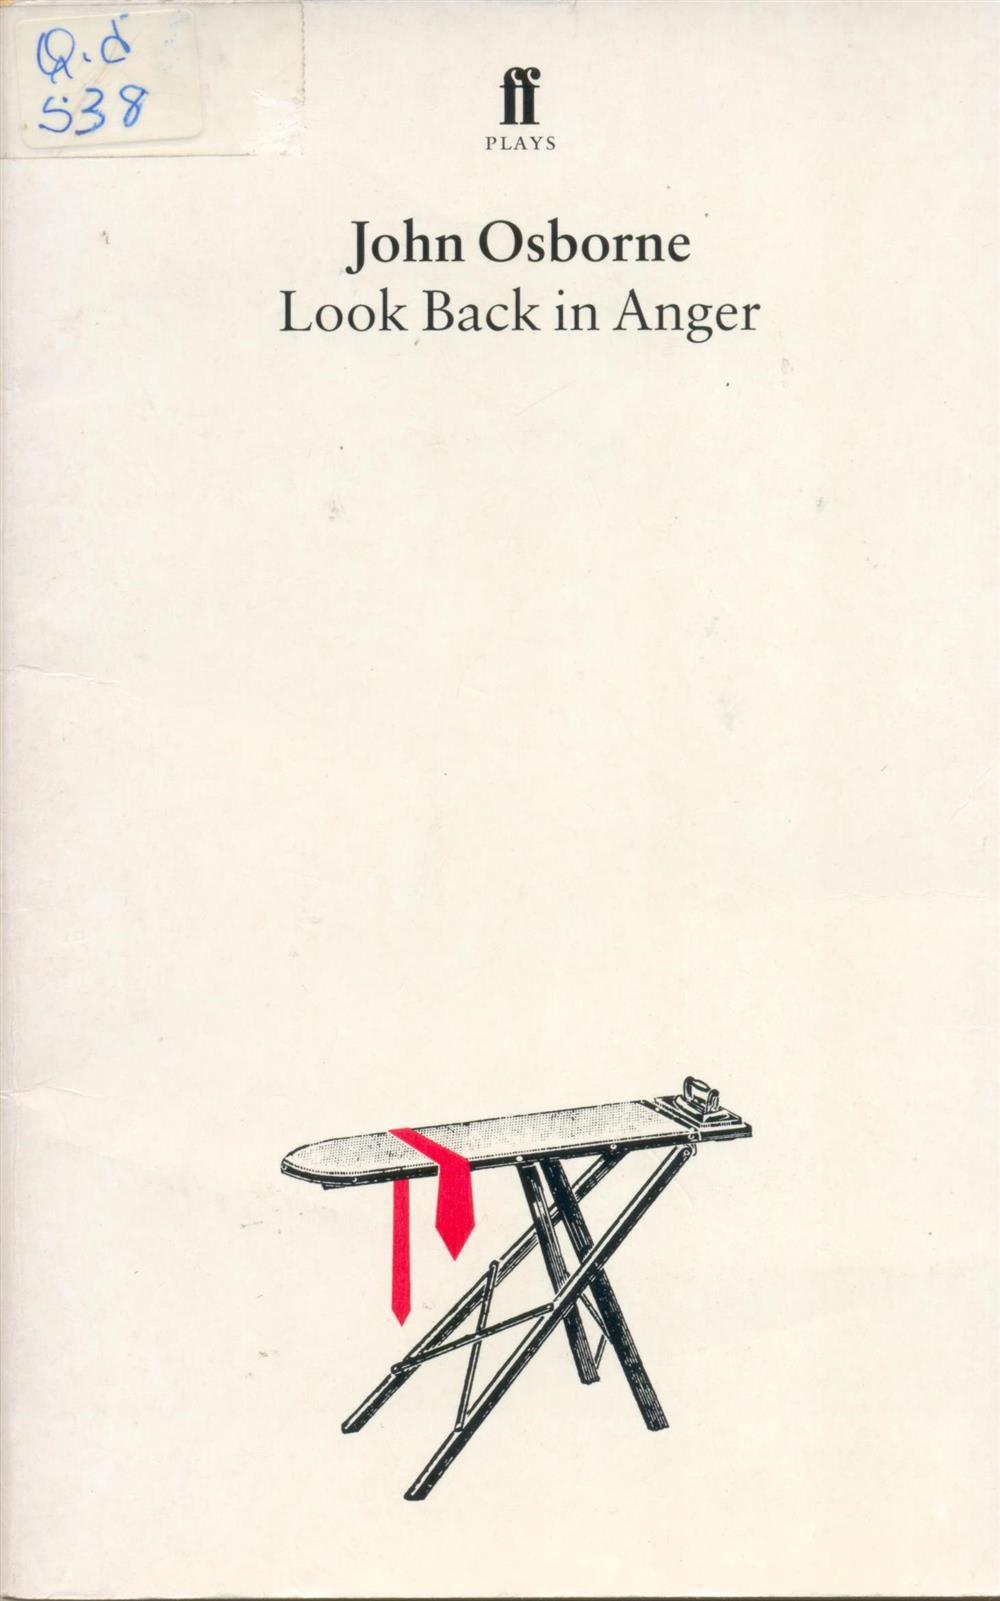 Look back in anger 001.jpg